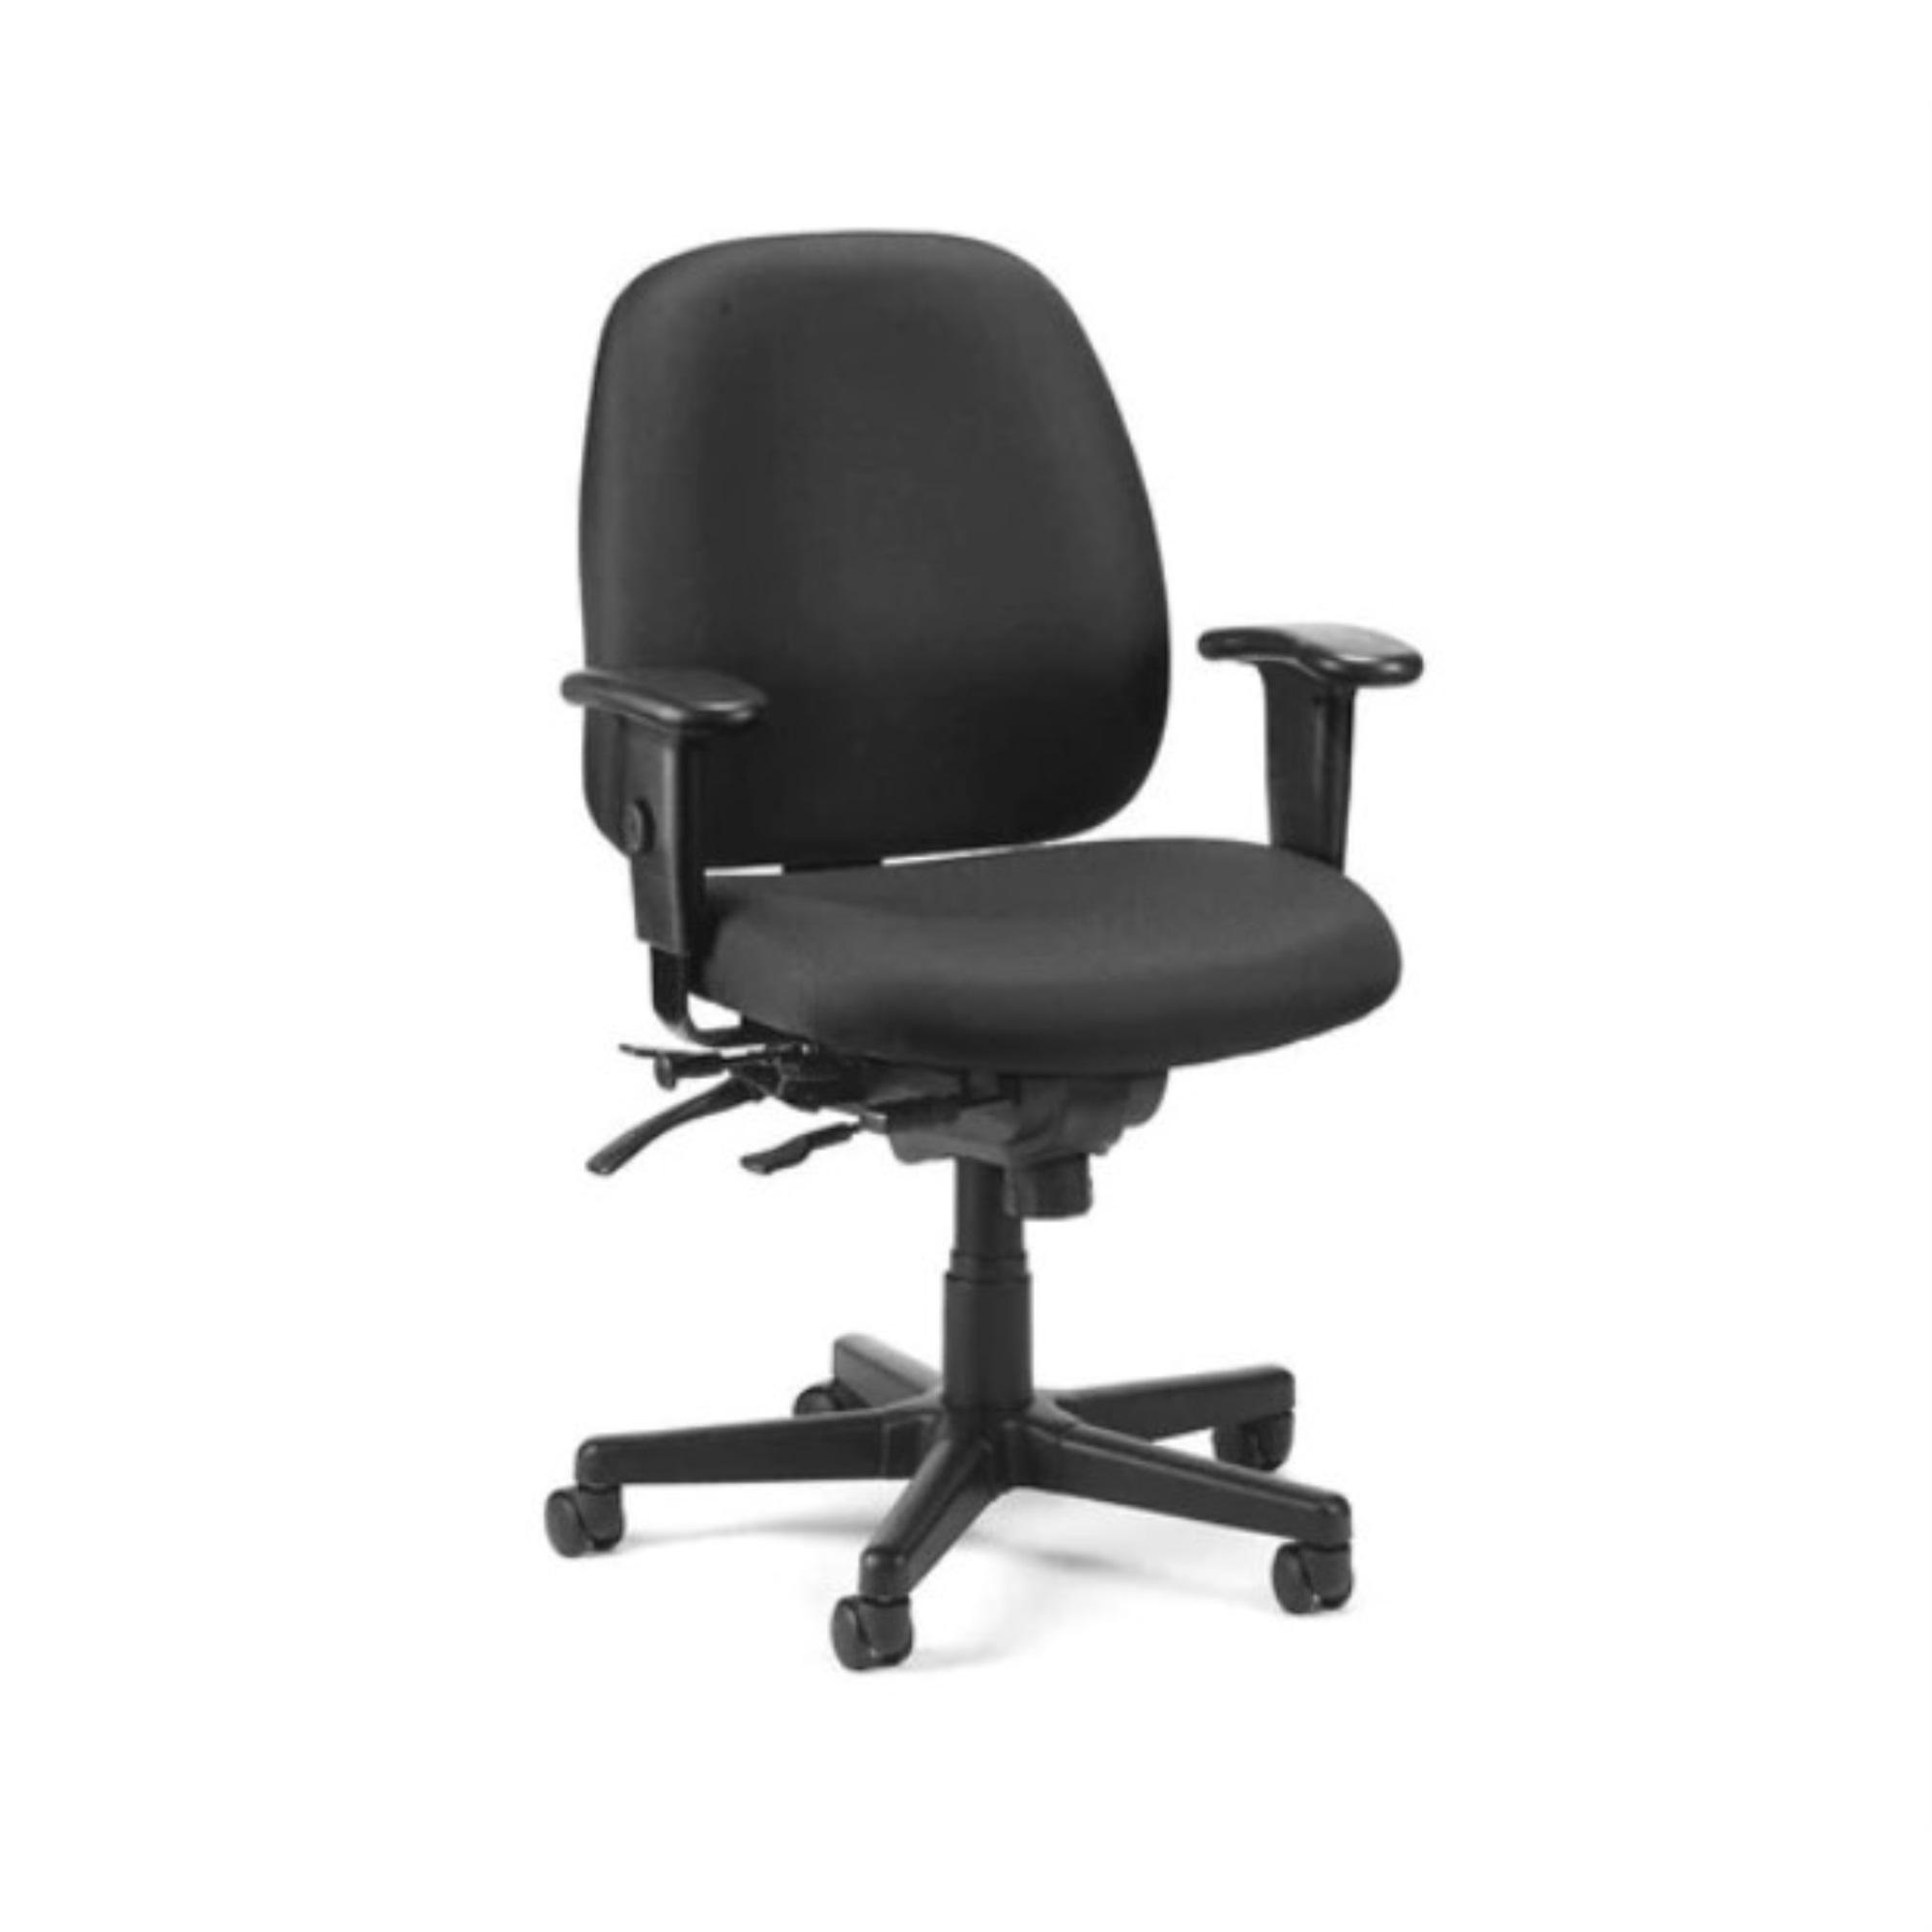 "29.5"" x 26"" x 37"" Black Fabric Seat Slider Swivel"